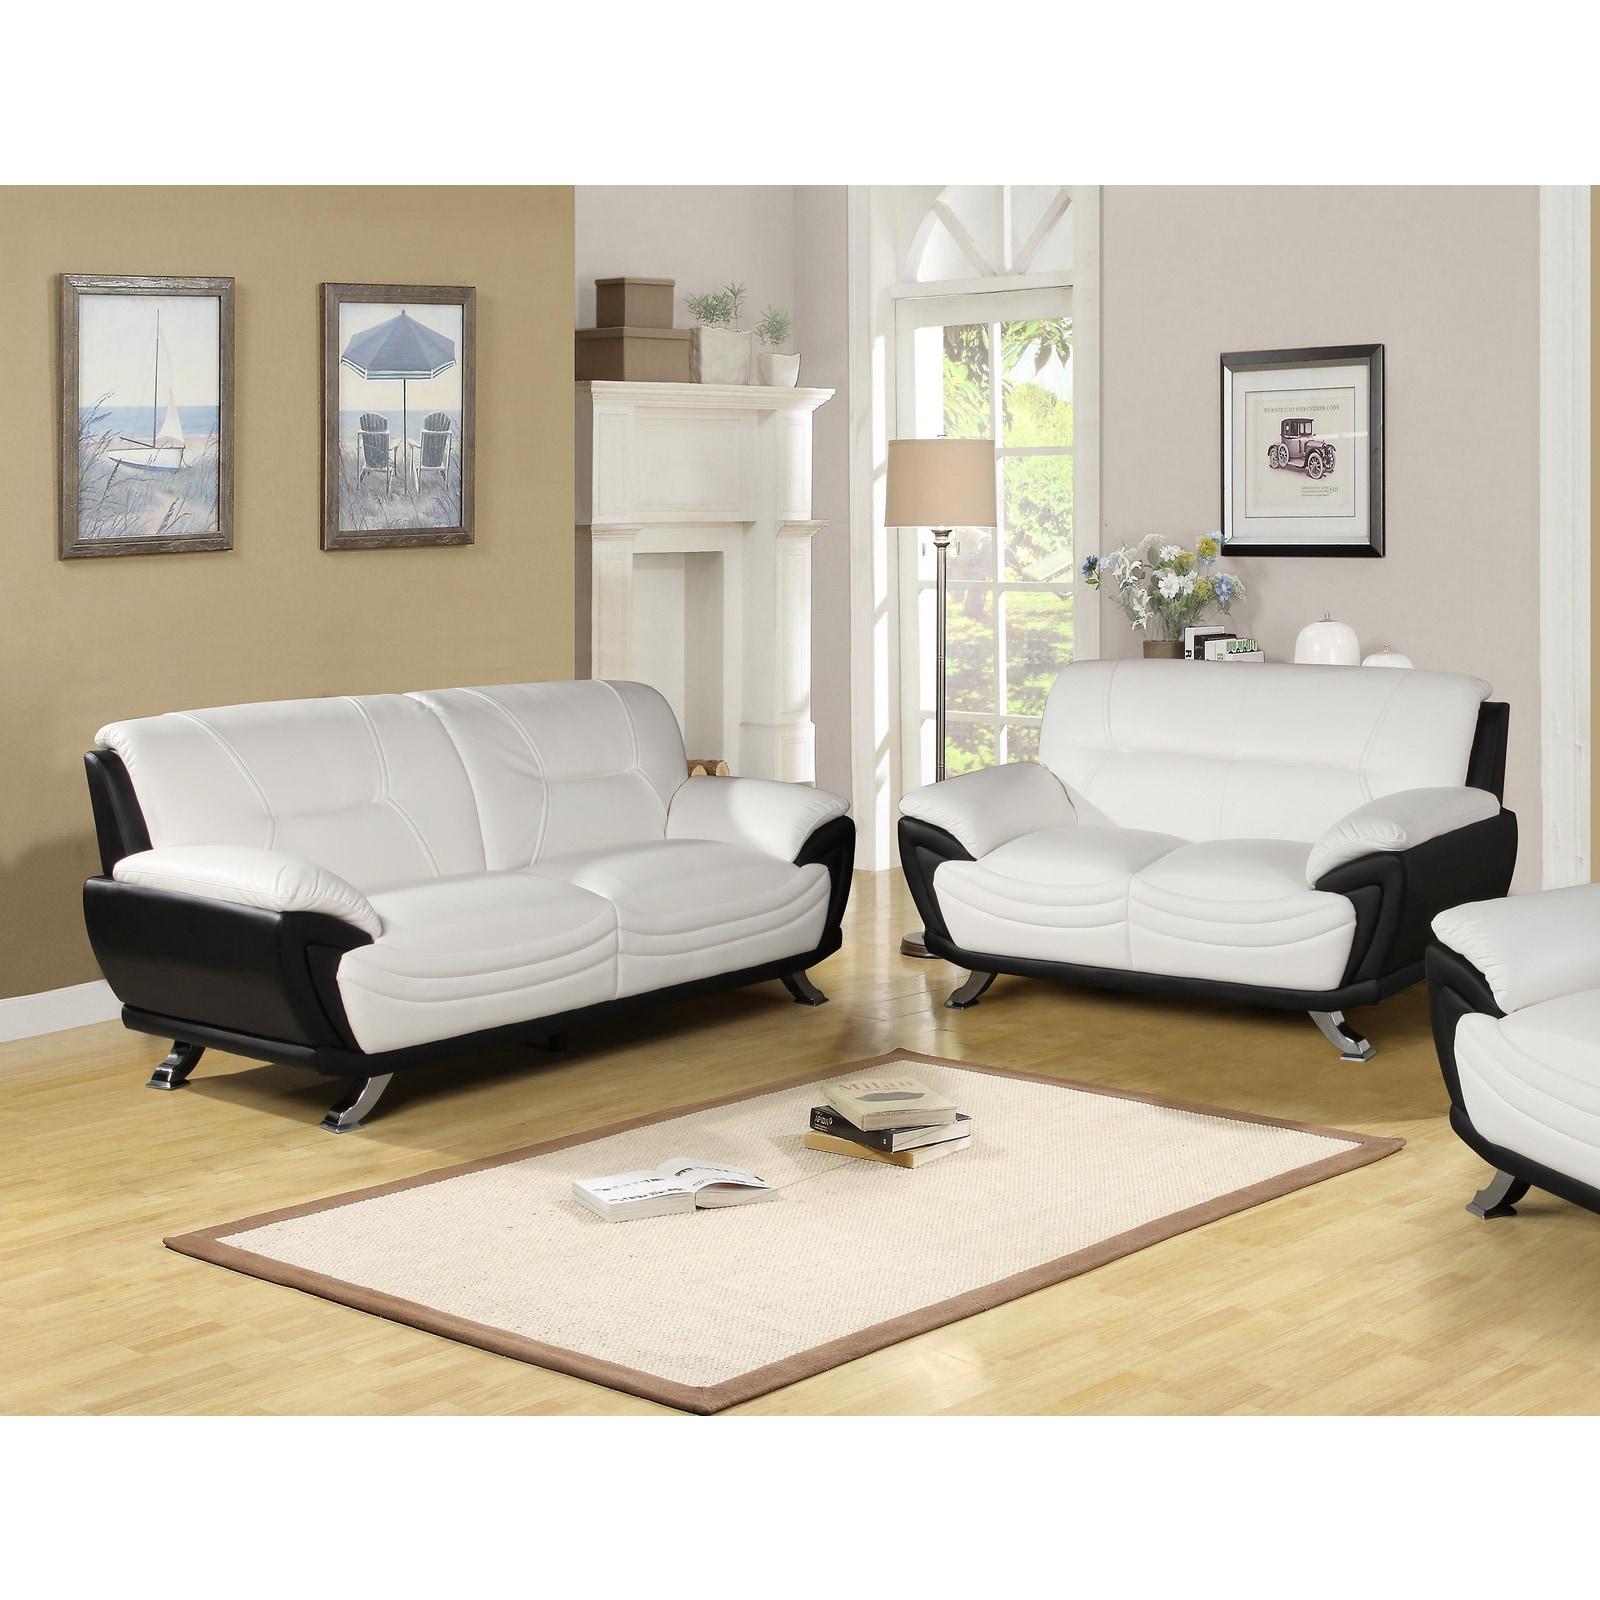 Black Two Tone Modern Sofa And Loveseat